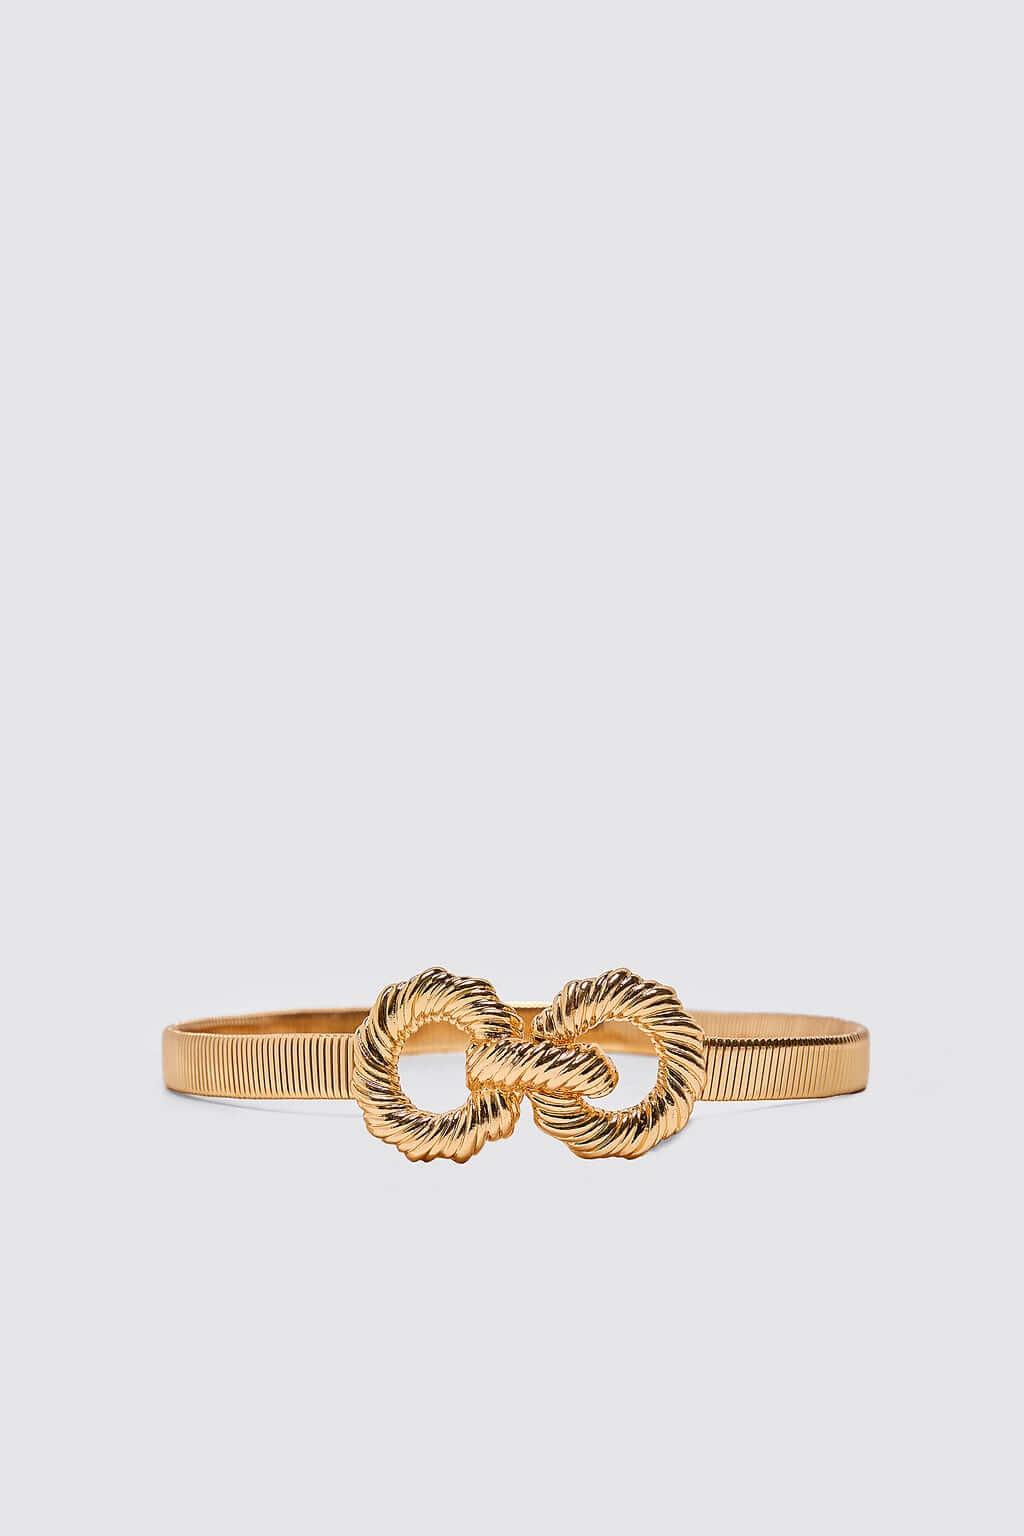 Zara chain belt